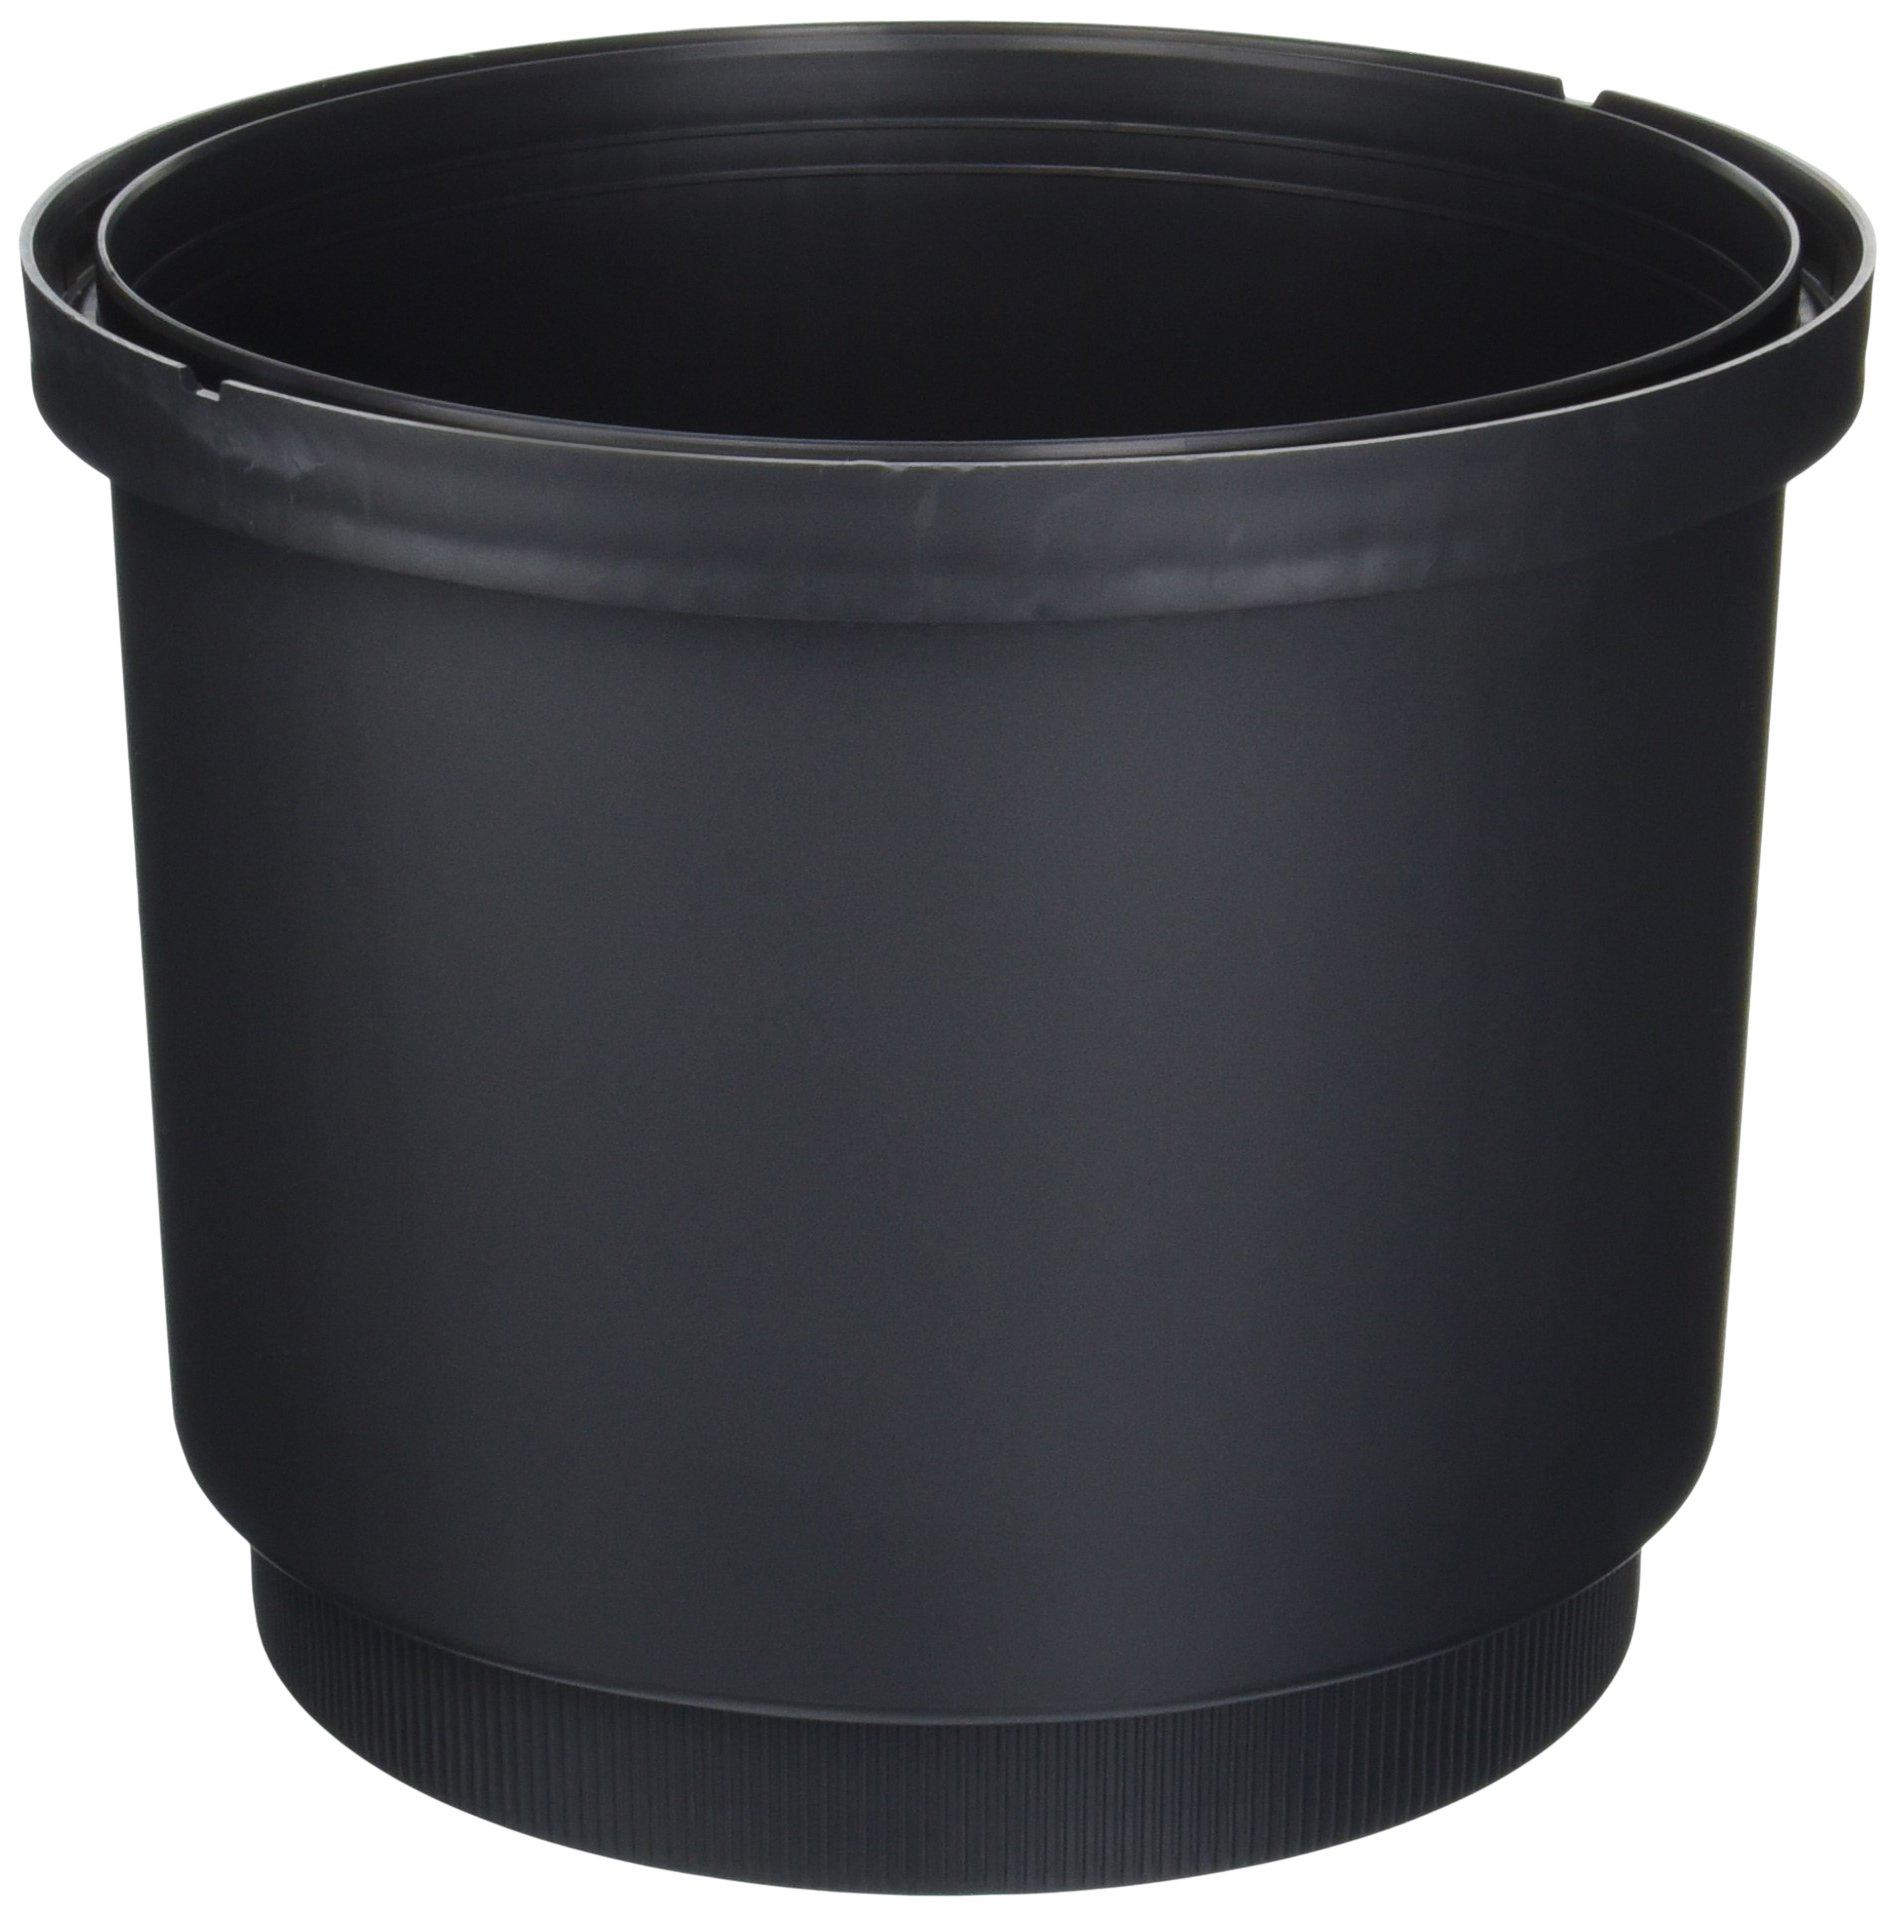 Laguna Case for Pressure Flo 700 Filter